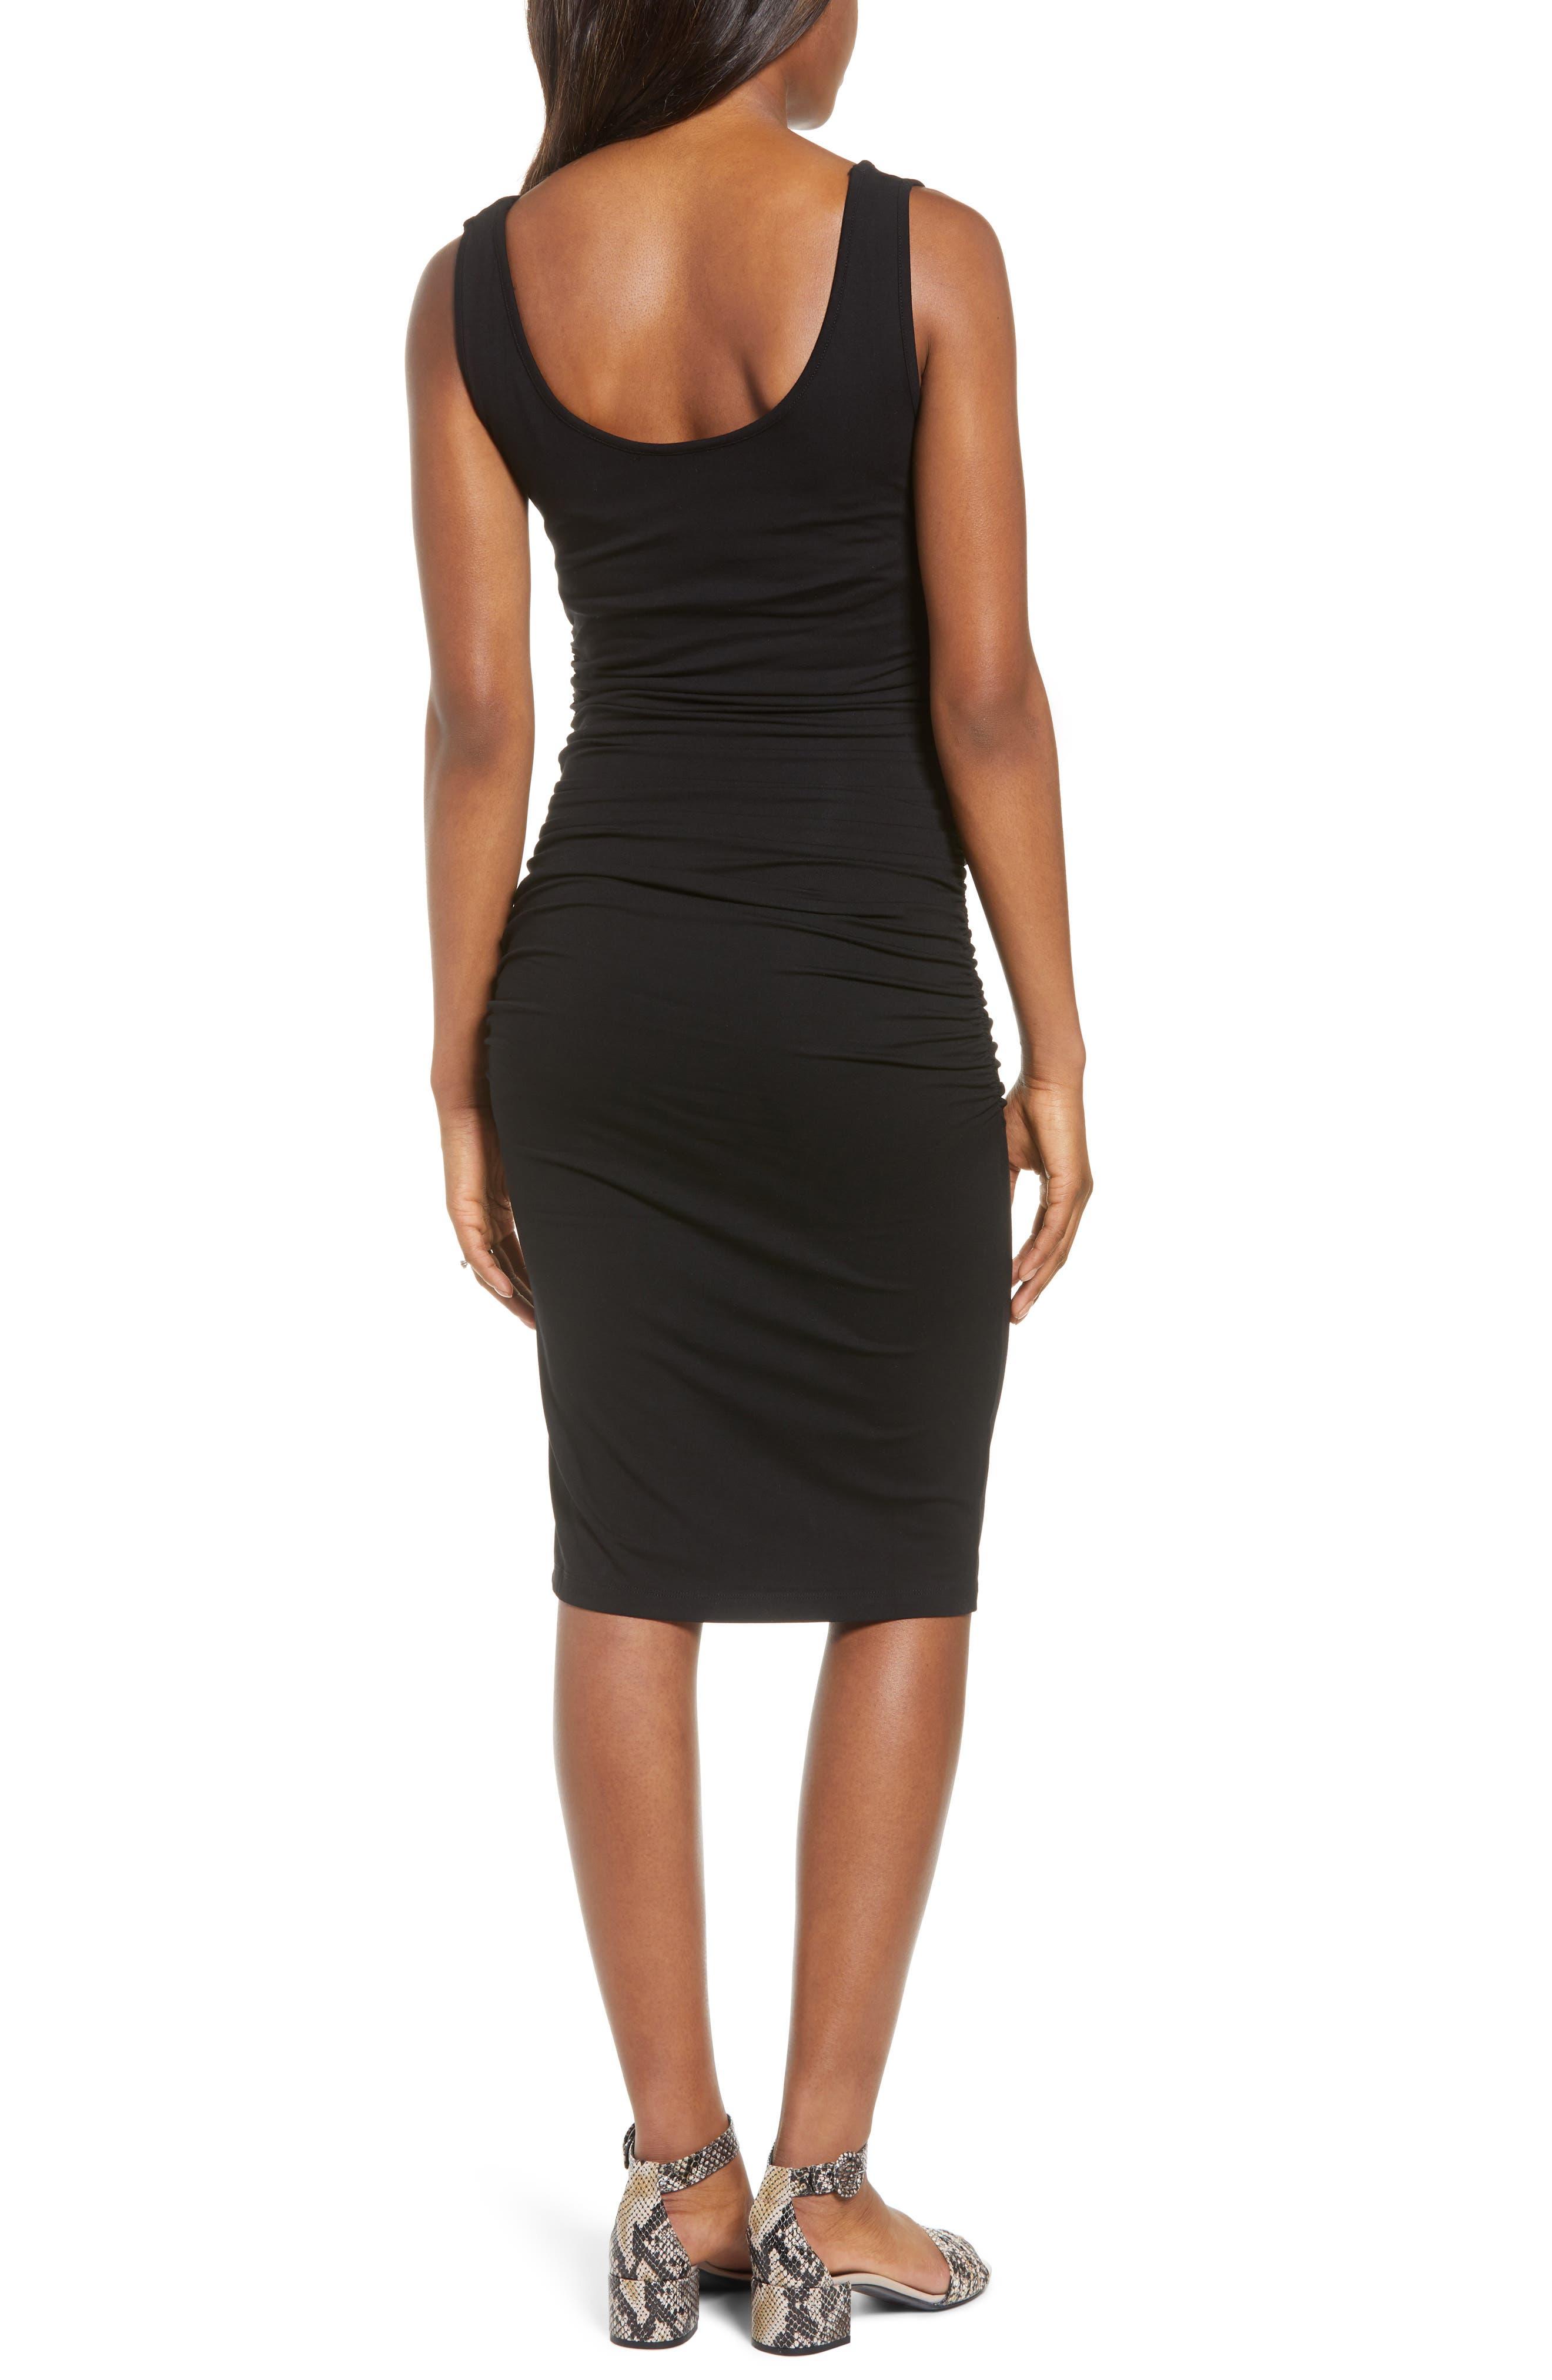 ISABELLA OLIVER, 'Ellis' Side Ruched Maternity Tank Dress, Alternate thumbnail 2, color, CAVIAR BLACK